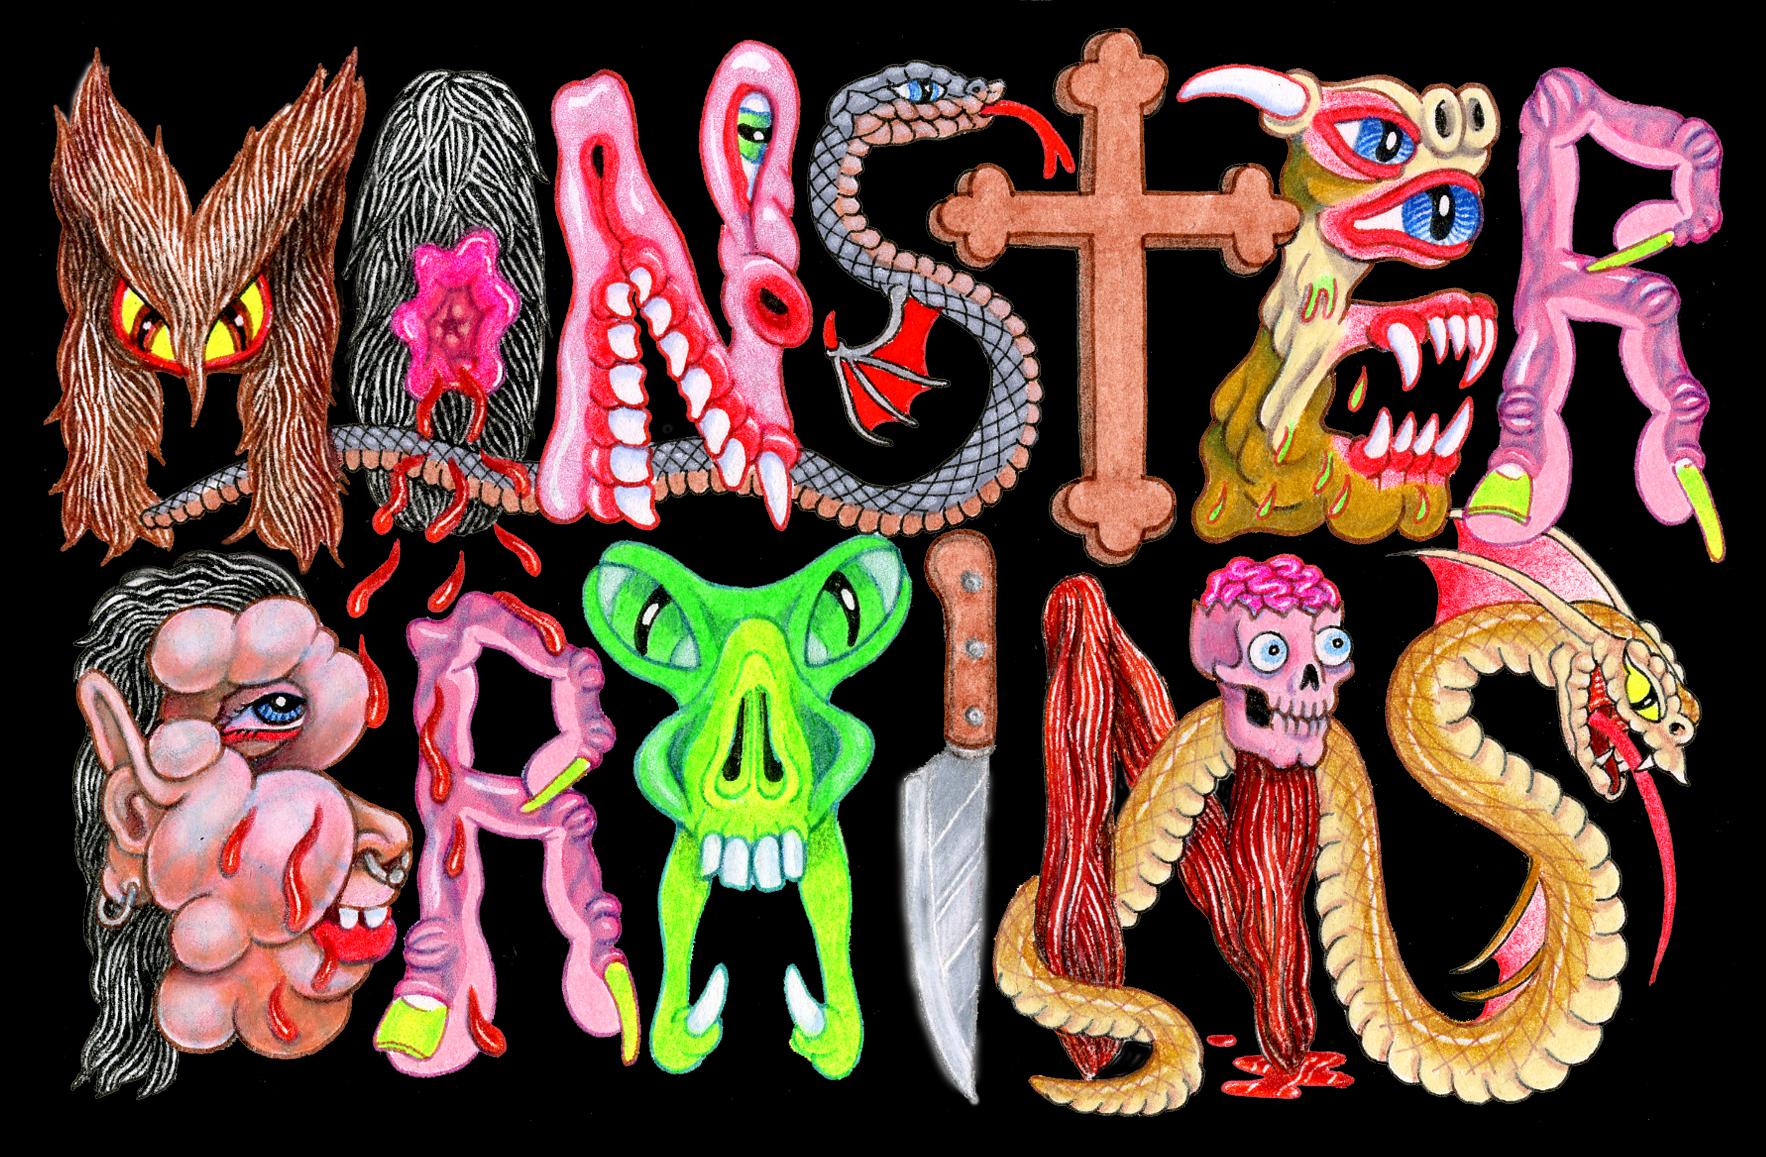 Monster dick top 10 adult galleries